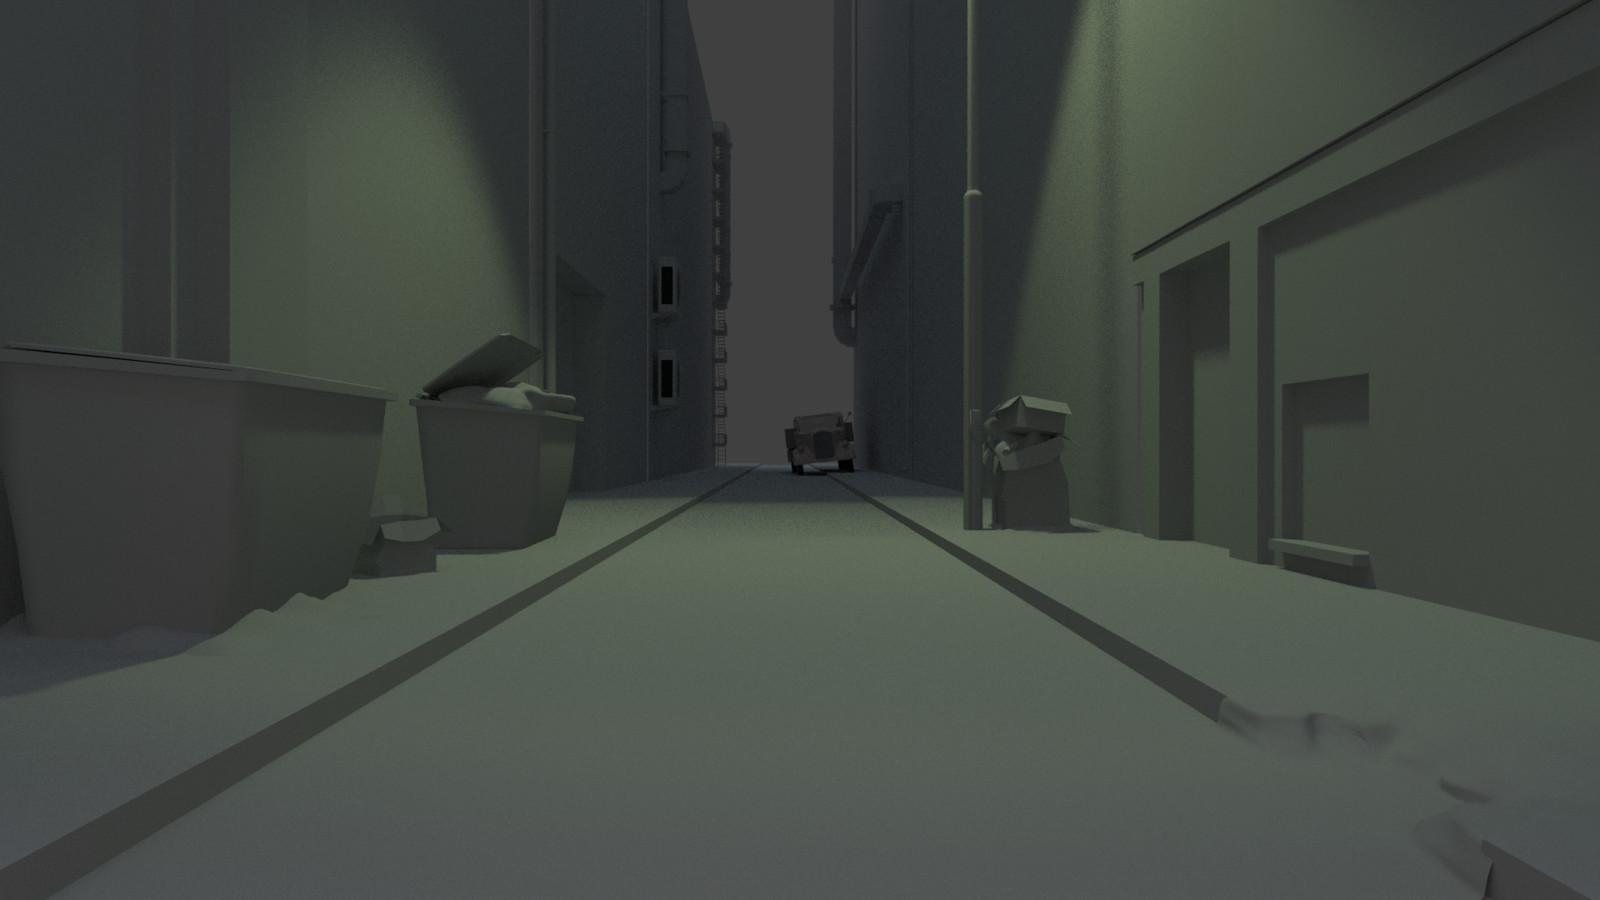 Base model of dark alley